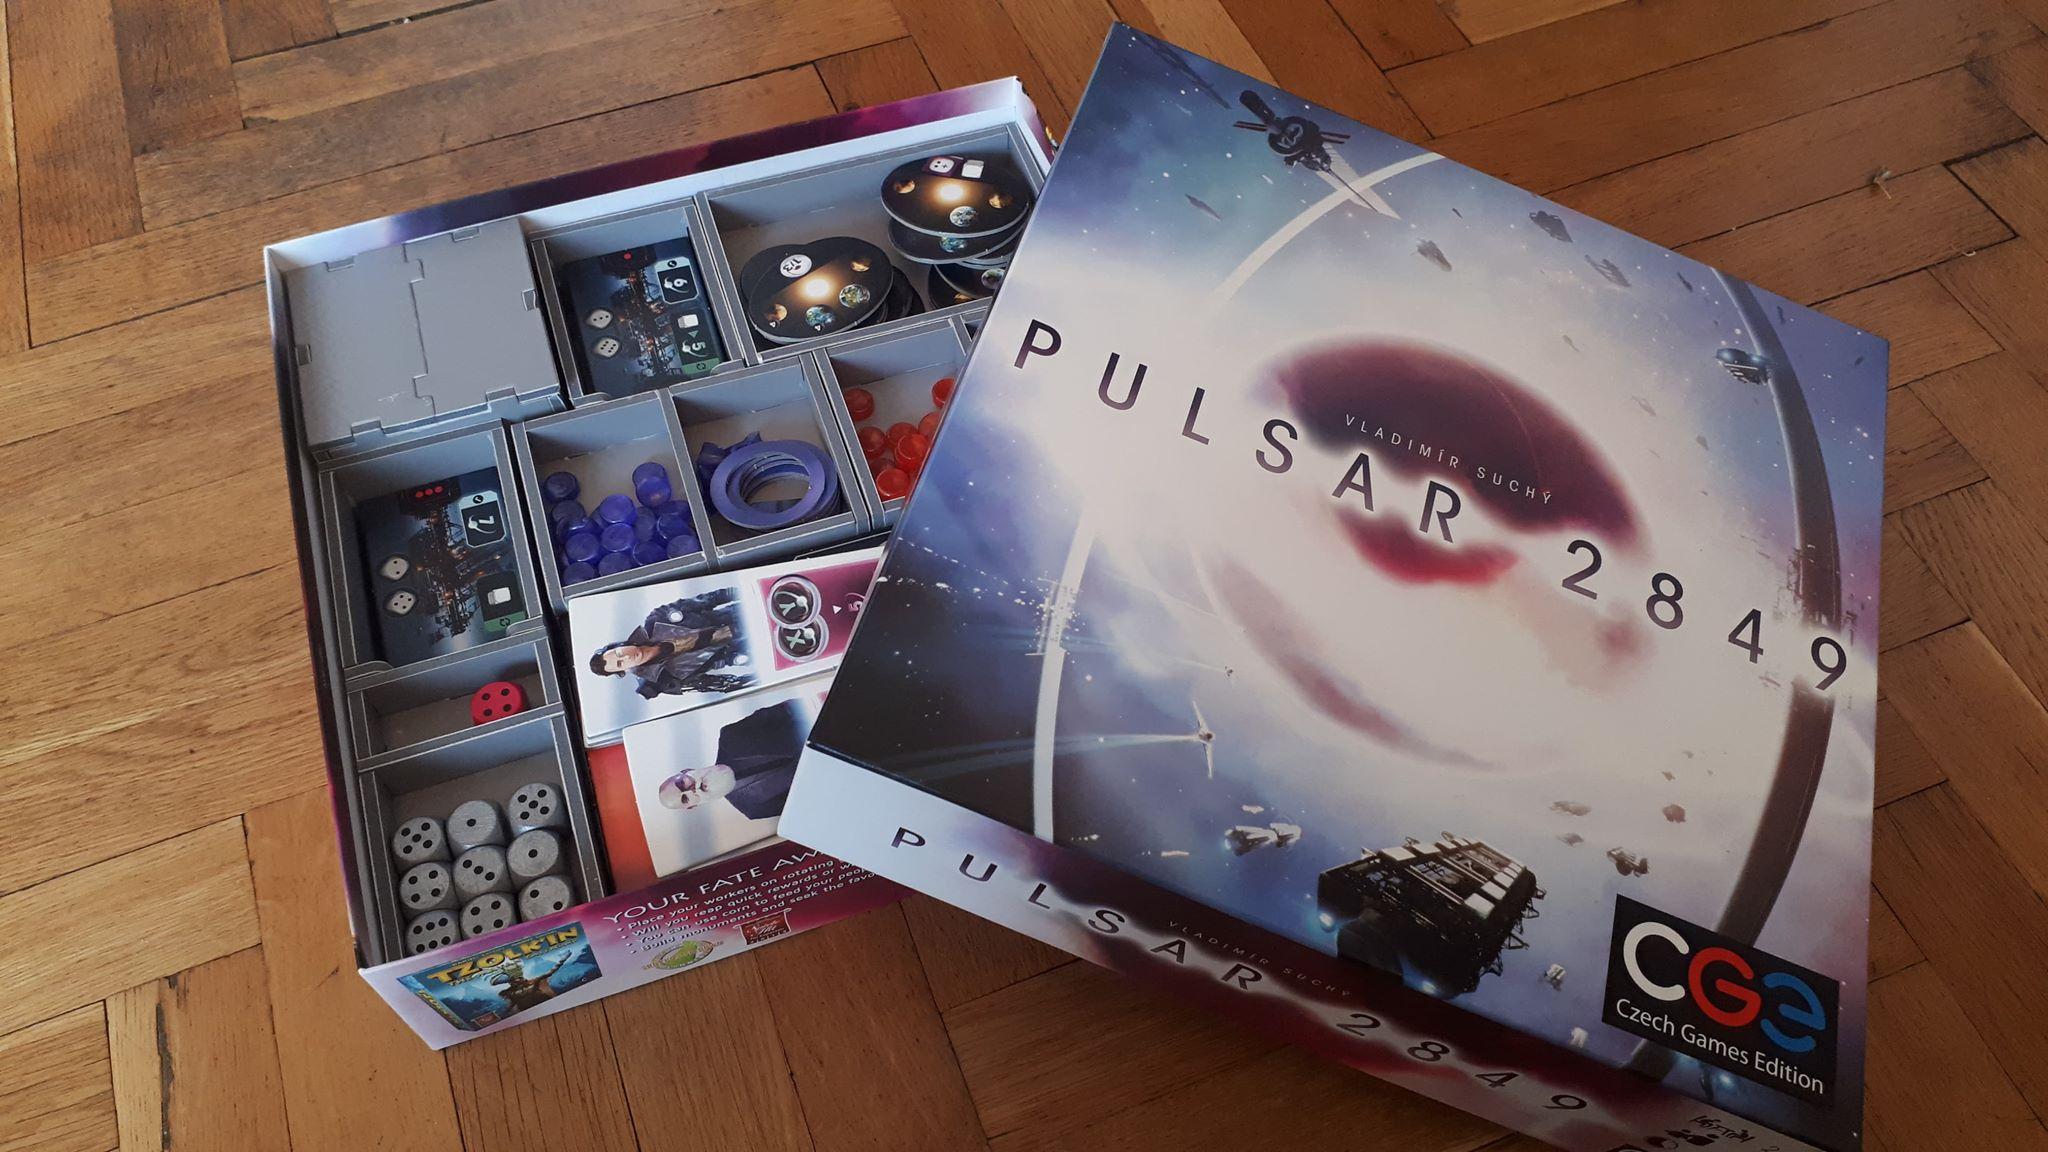 Folded Space – Pulsar 2849 Insert